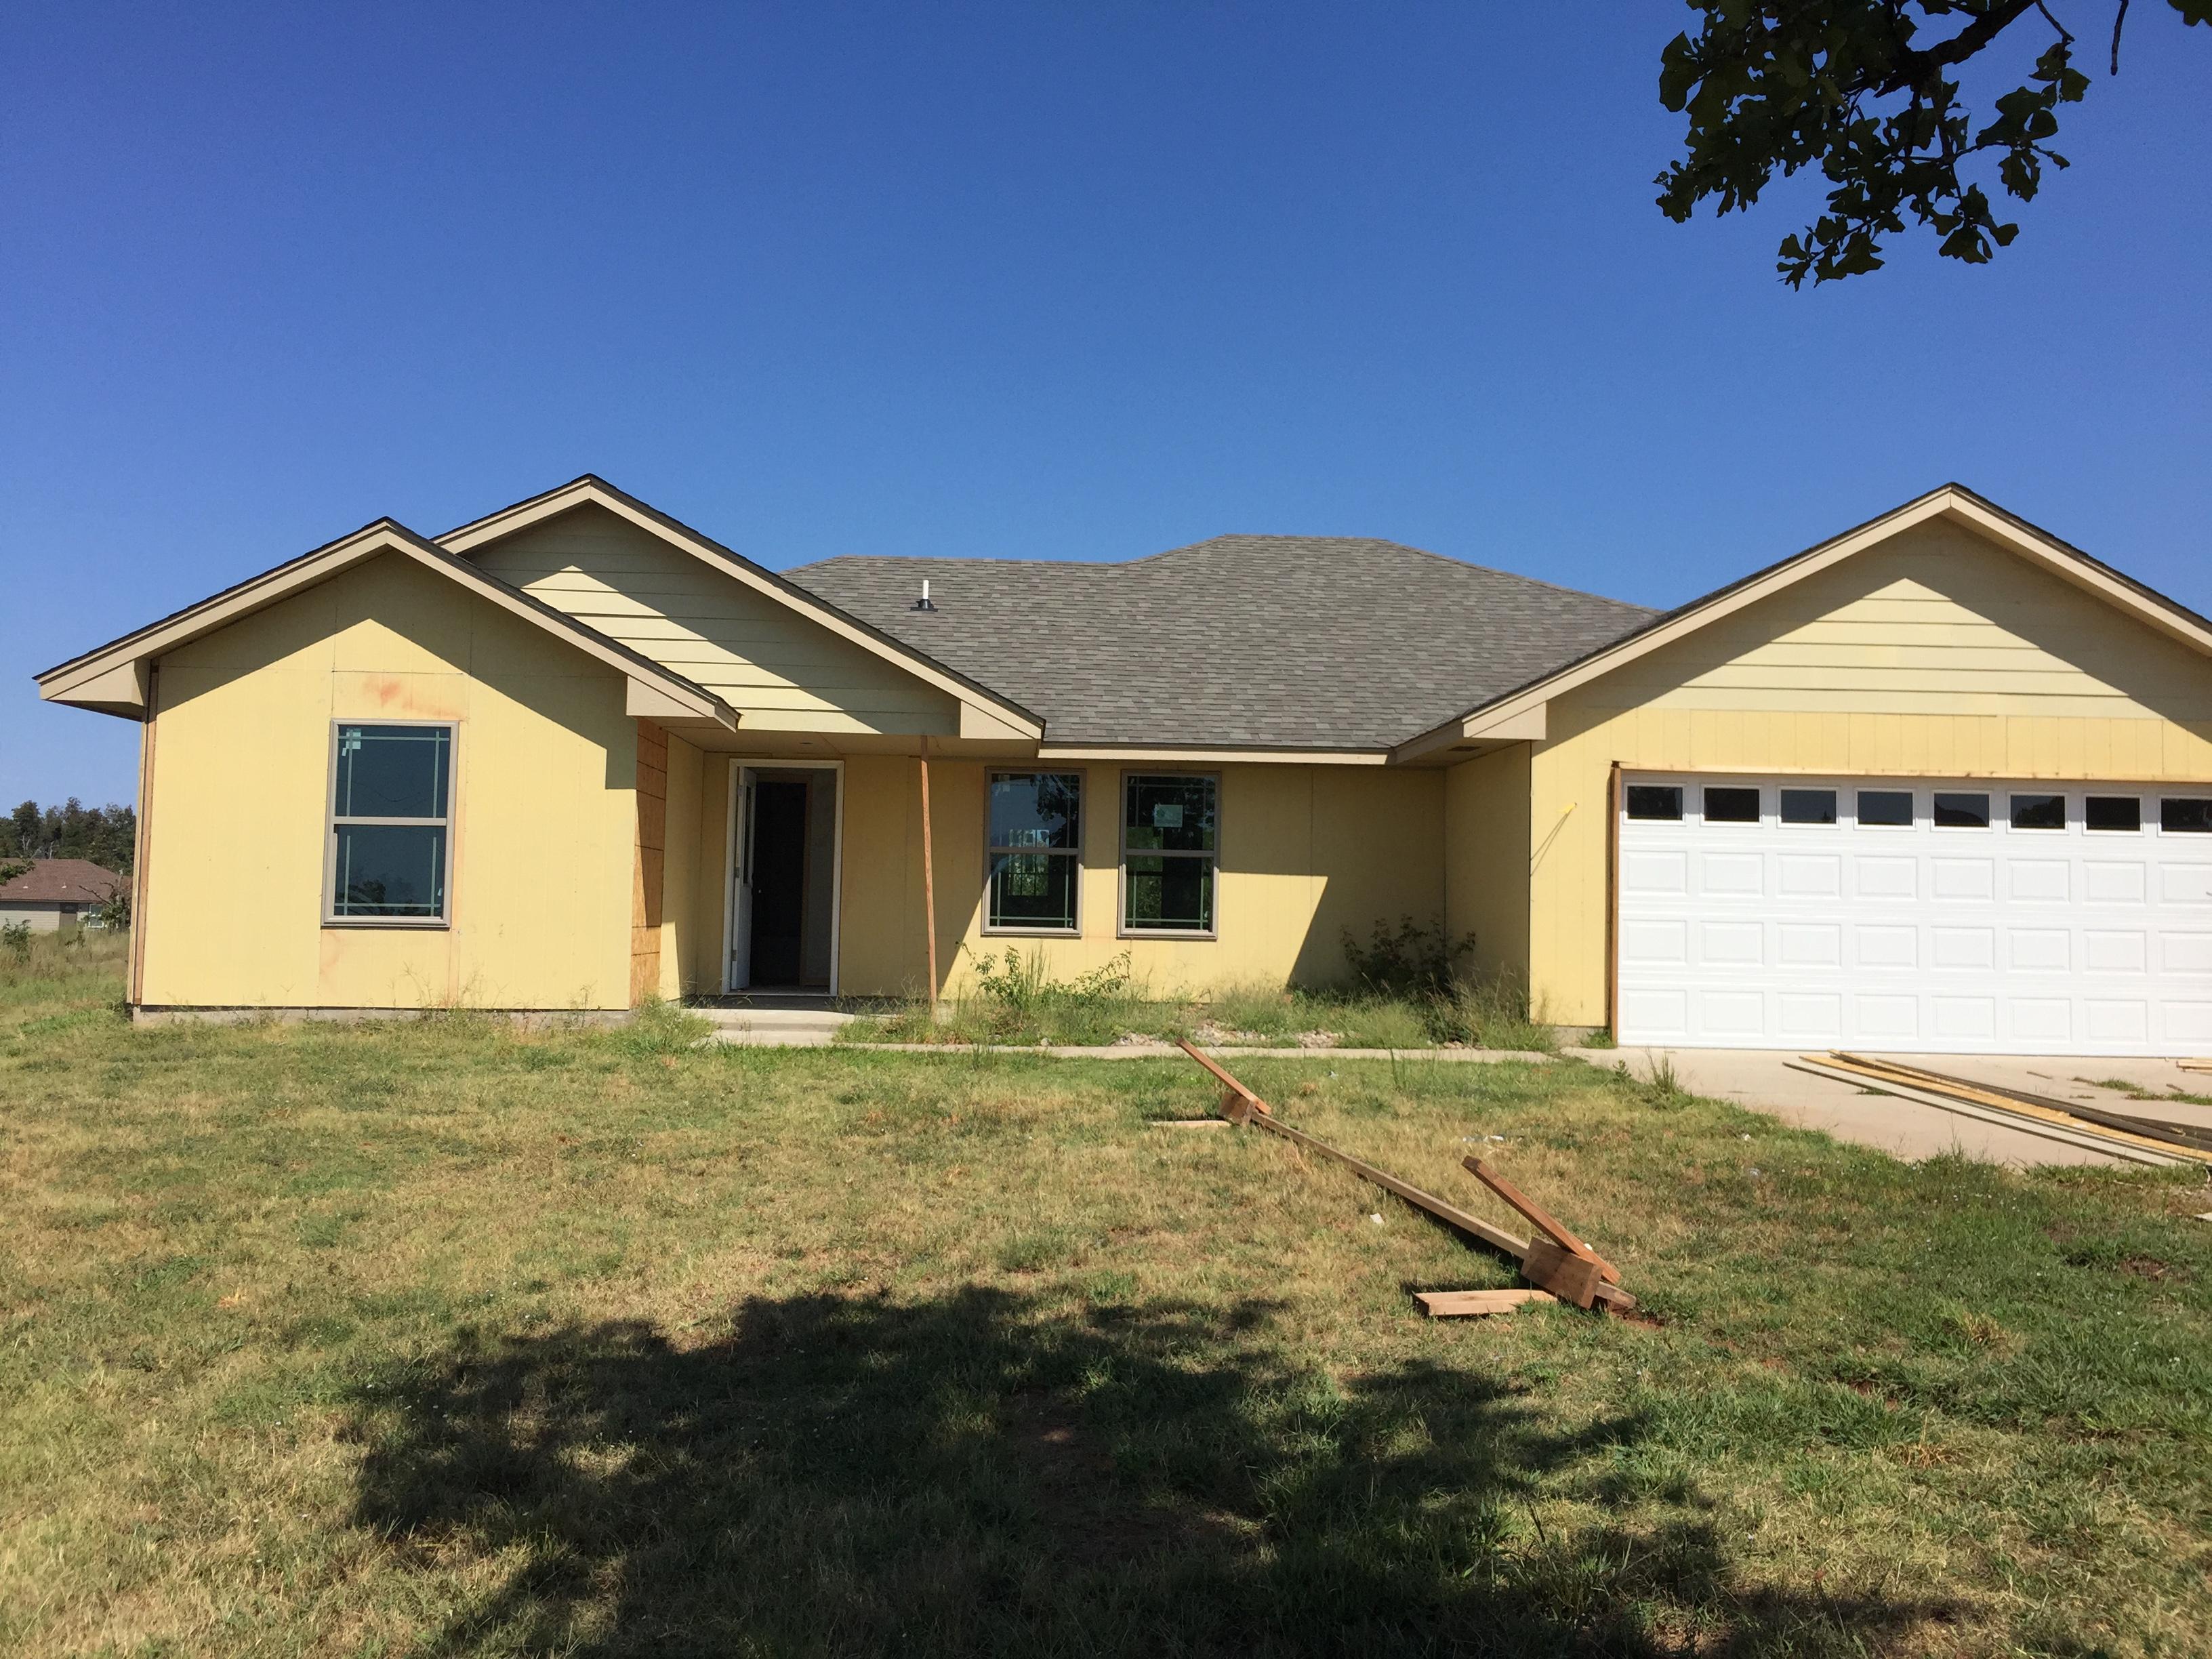 17215 Cottonwood Ct, Newalla, Oklahoma 74857